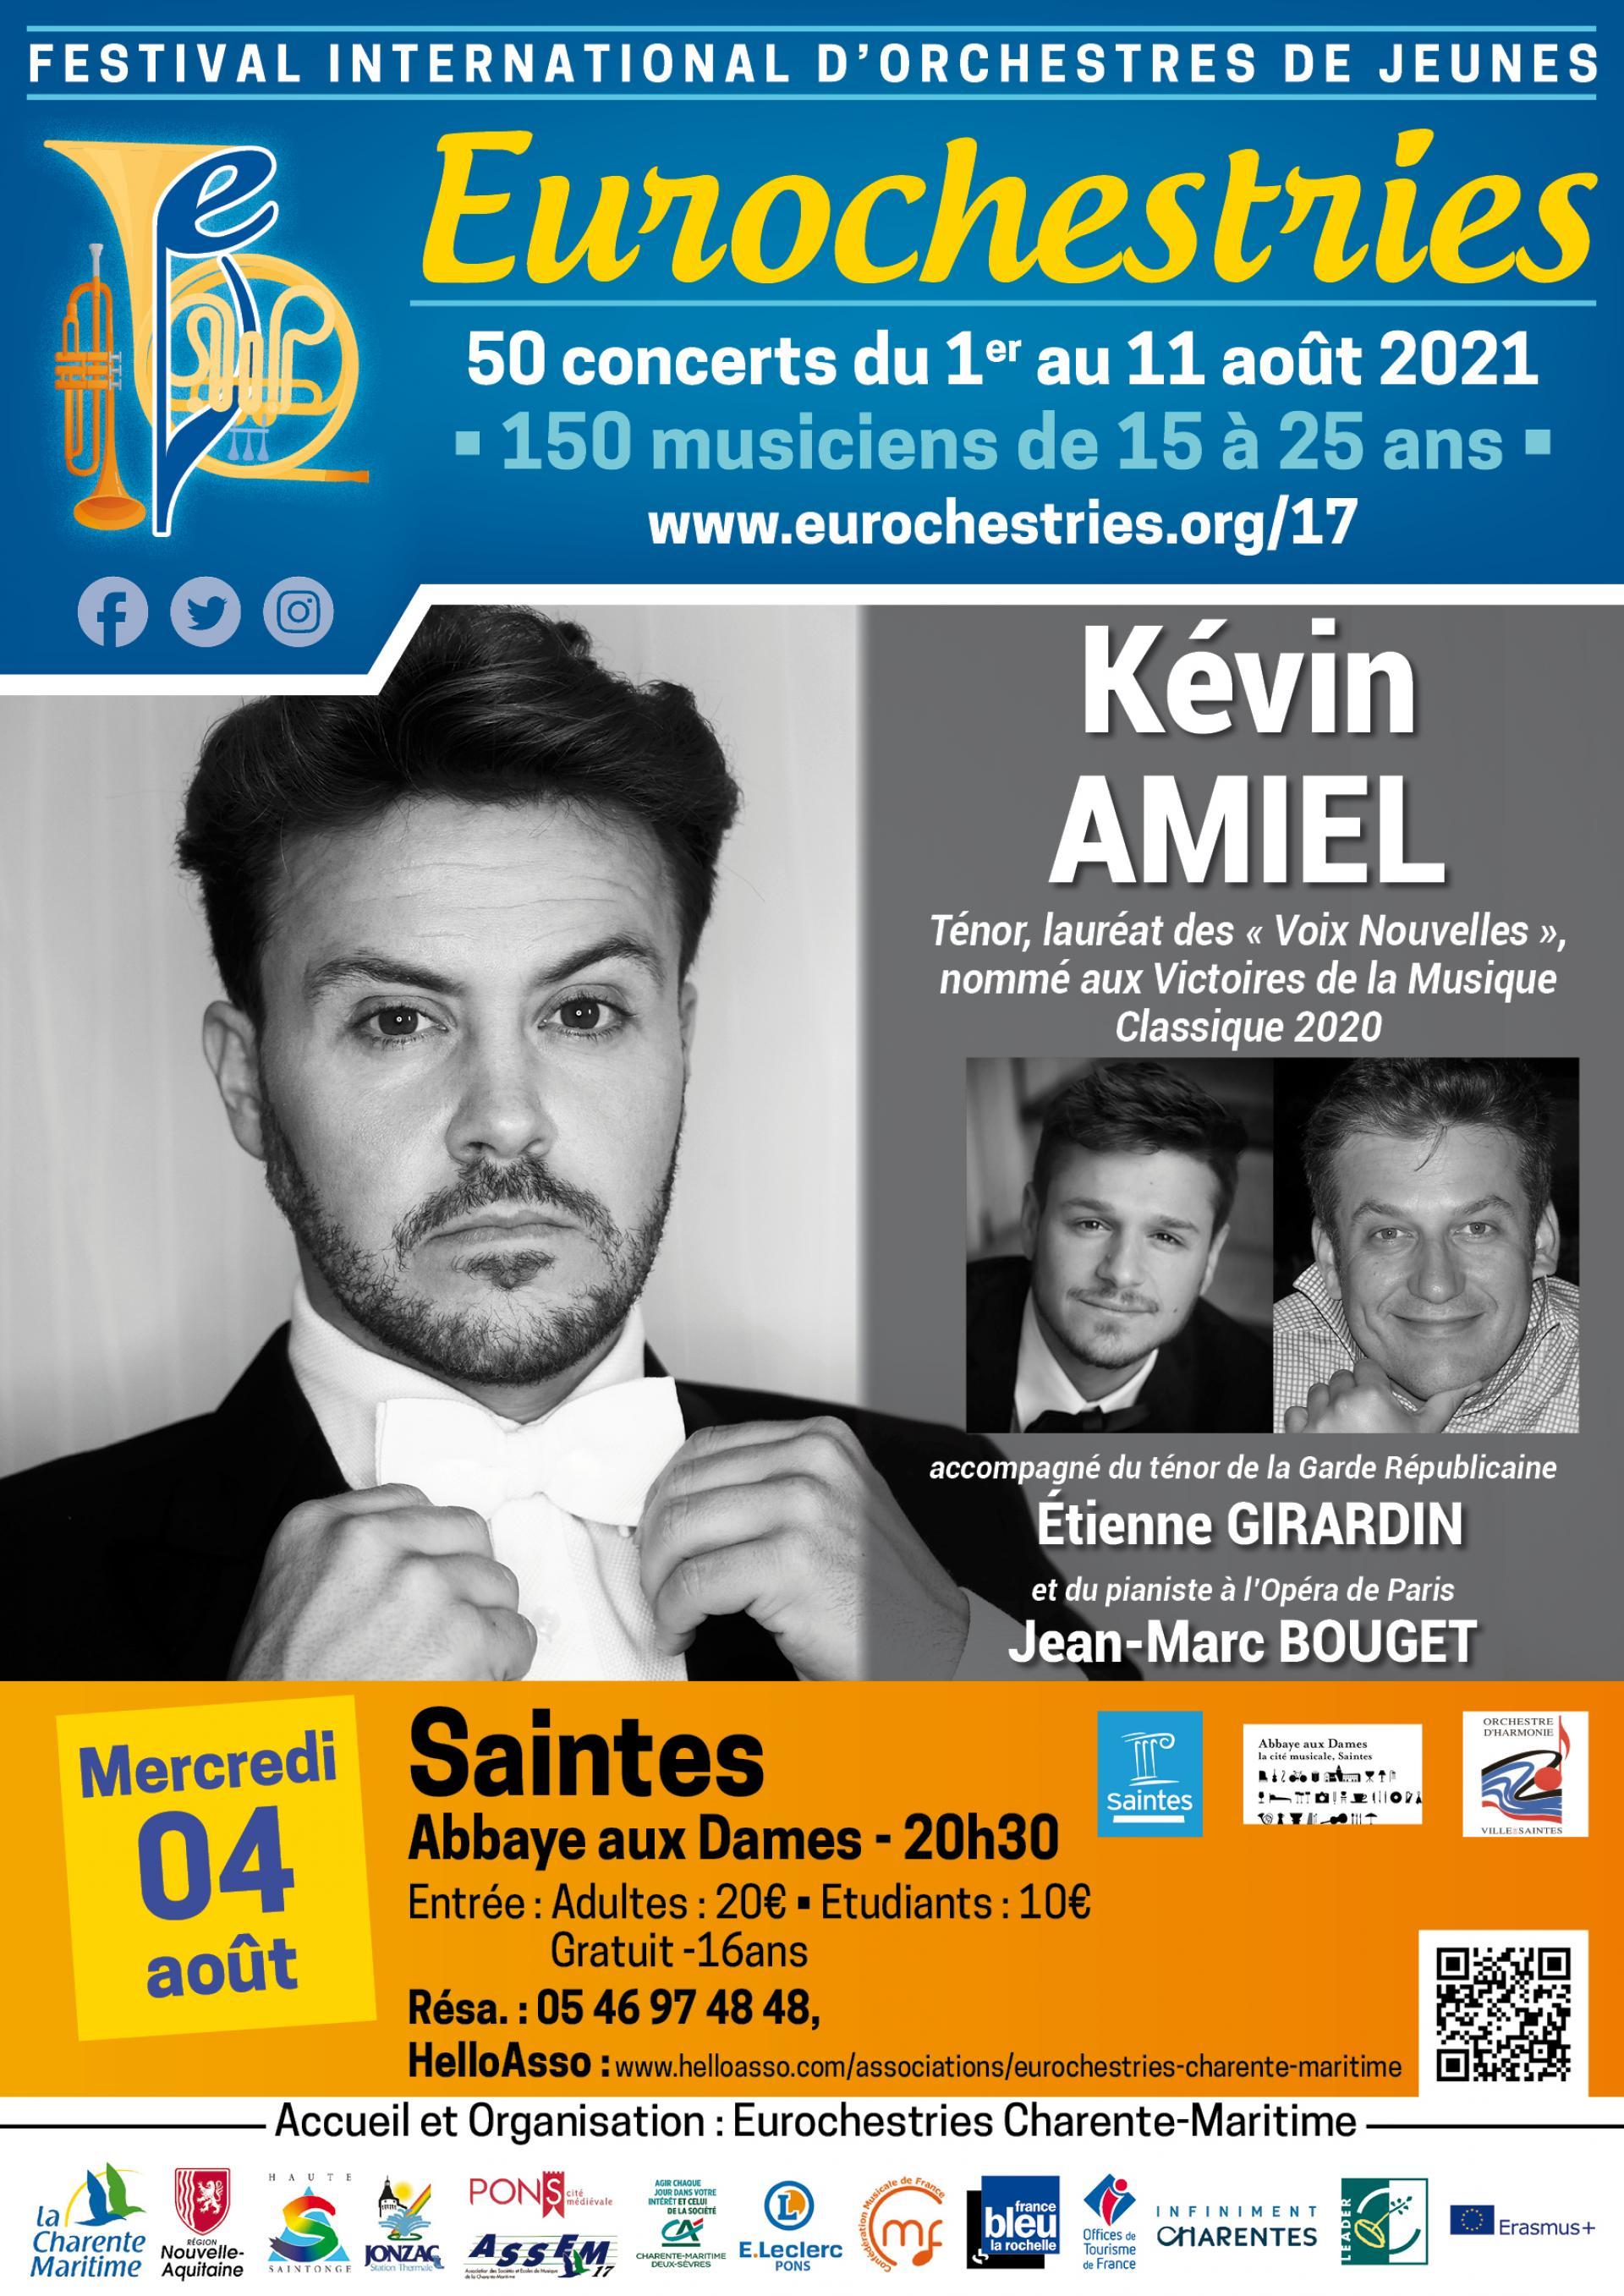 Kevin Amiel Saintes